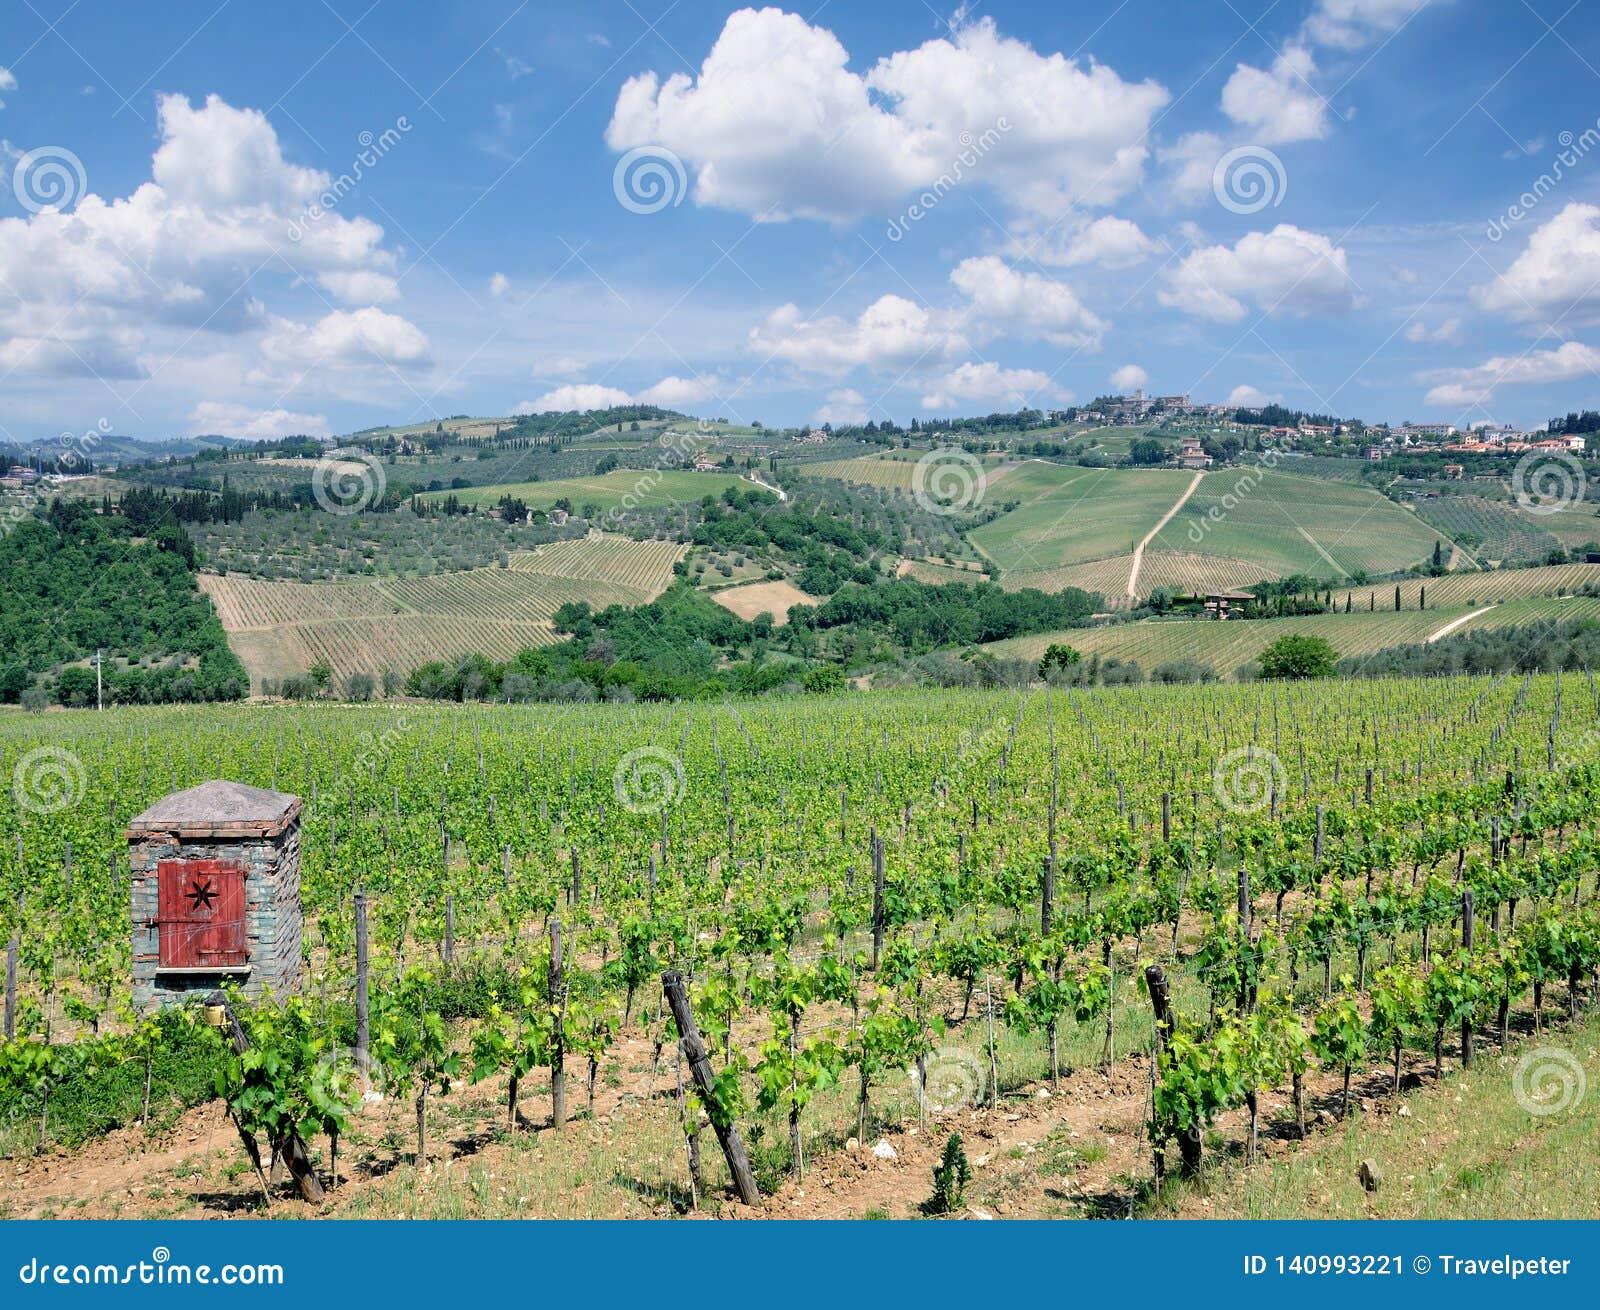 Paisaje del viñedo, región de Chianti, Toscana, Italia